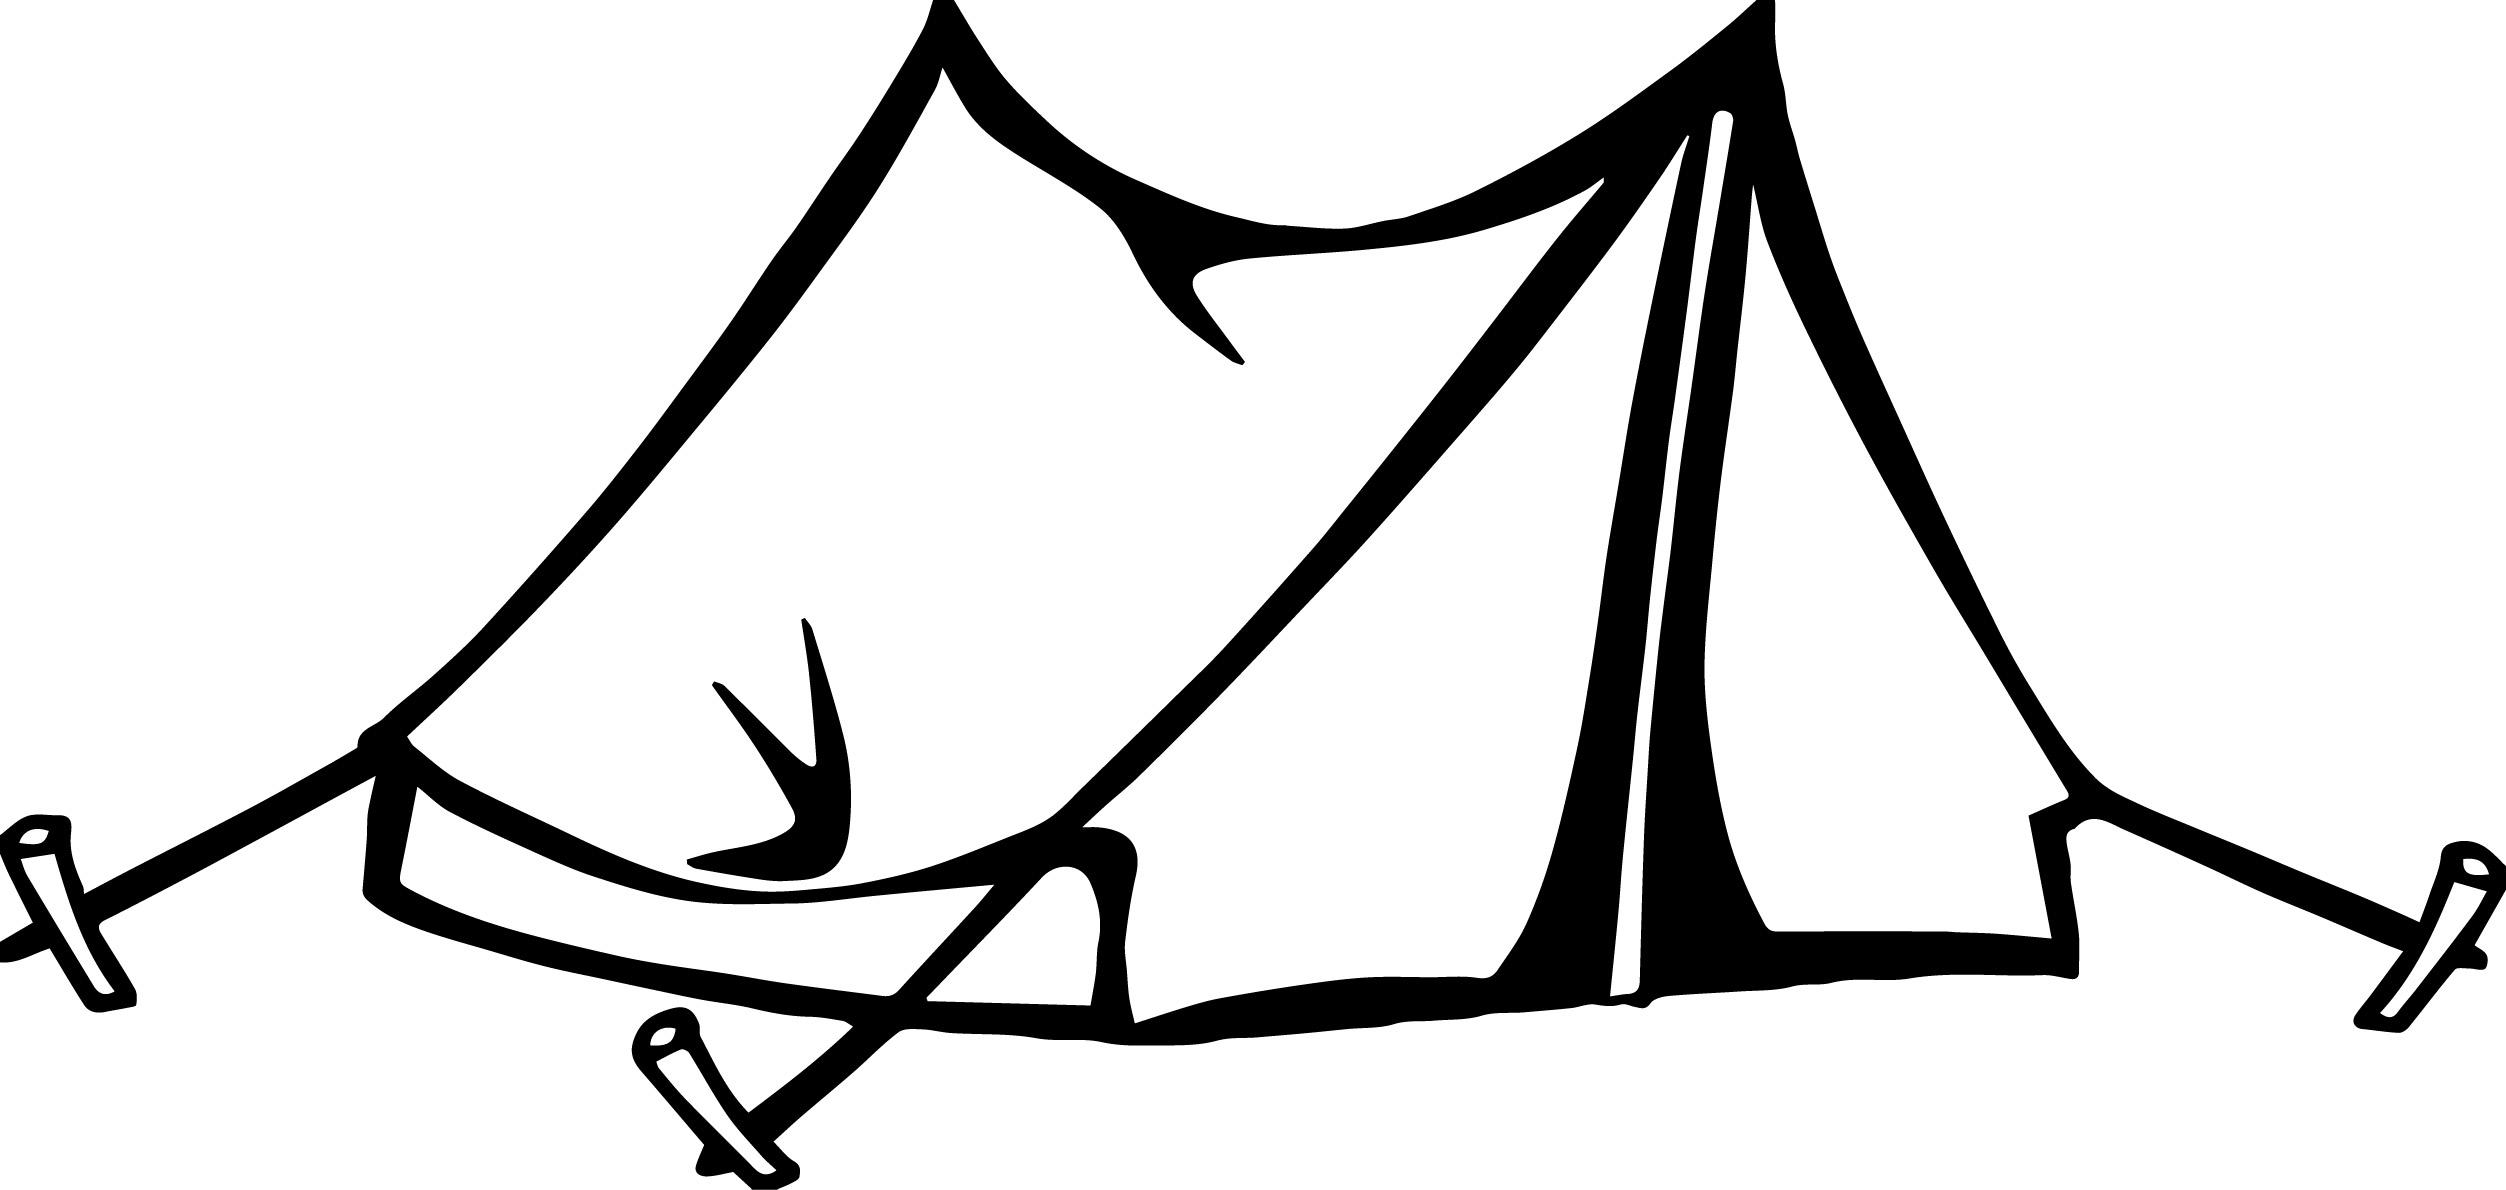 Tent coloring #6, Download drawings